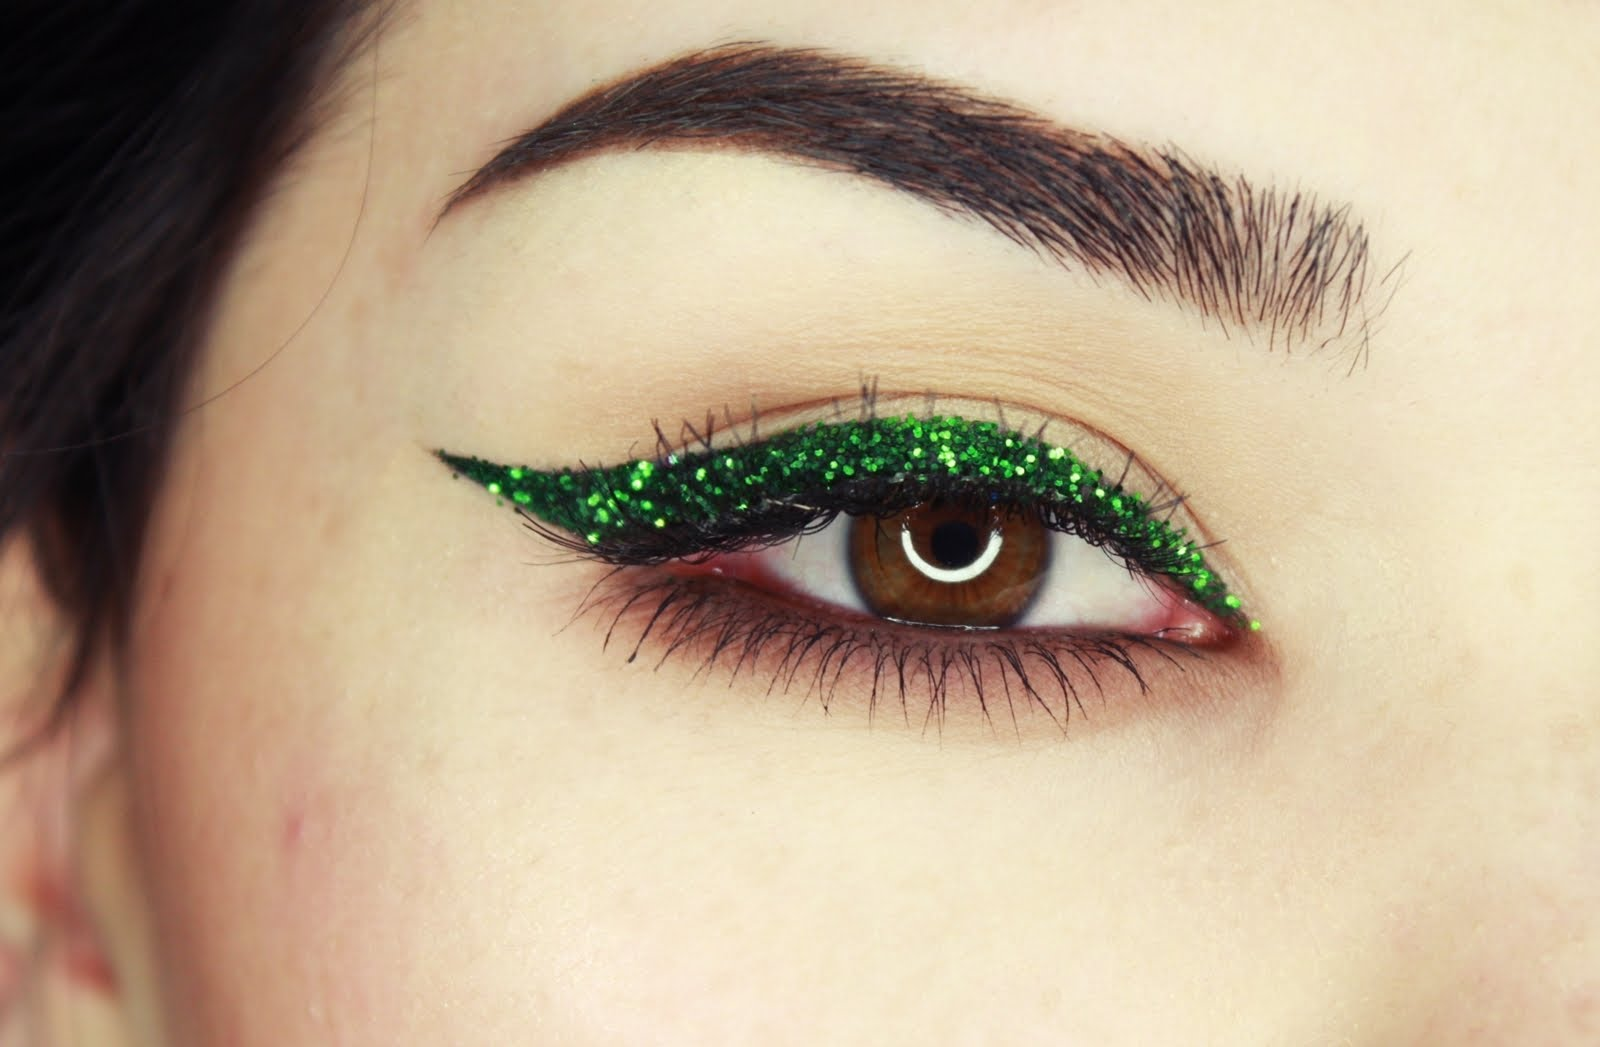 metallic eyeliner 1 - 10 Eyeliner Styles for Beginners - Step By Step Tutorial with Images